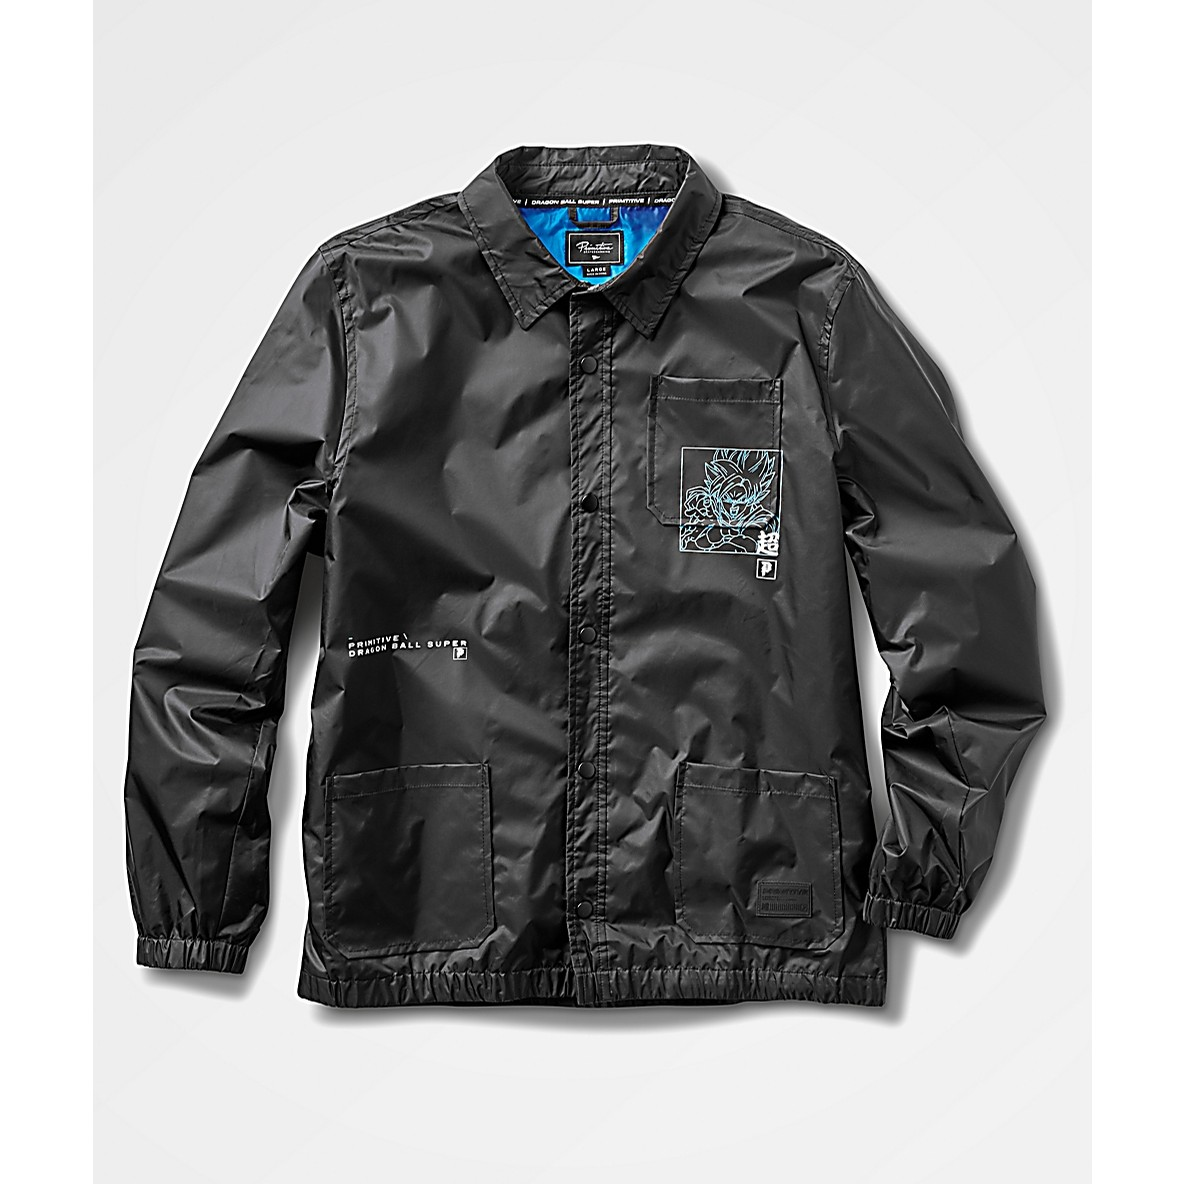 SSG Goku Jacket